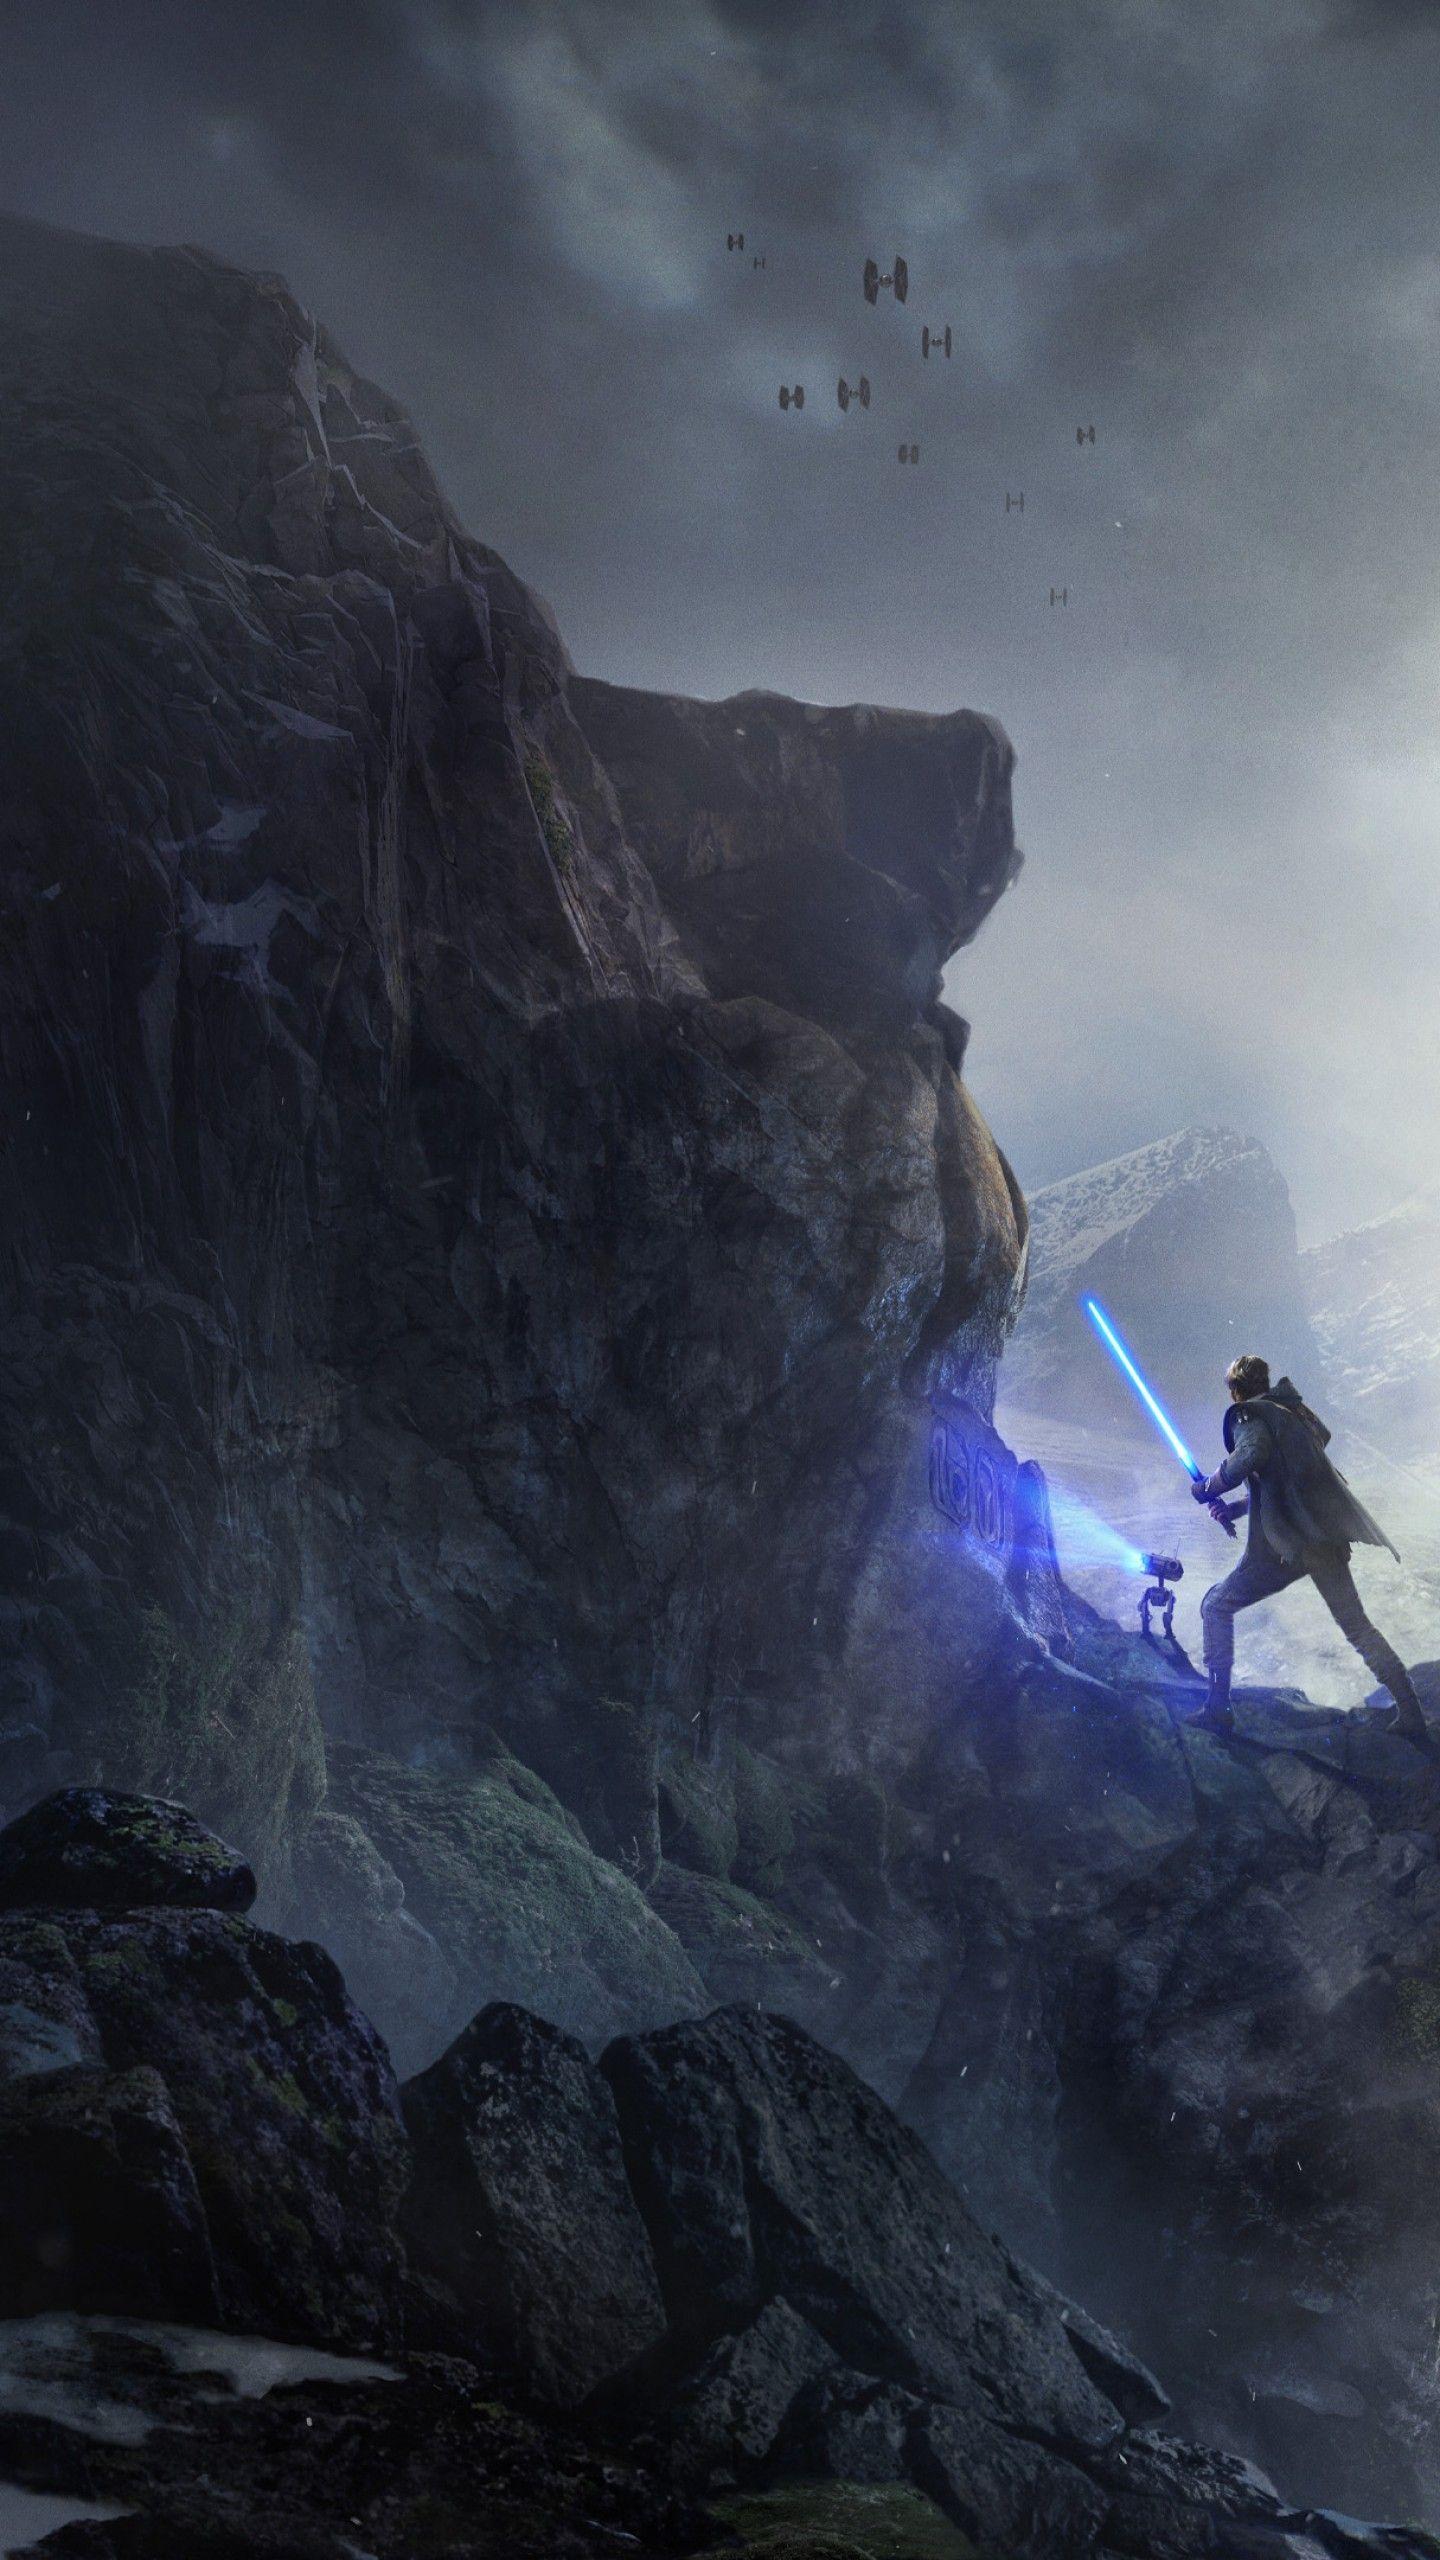 Star Wars Jedi Fallen Order Wallpapers , Top Free Star Wars